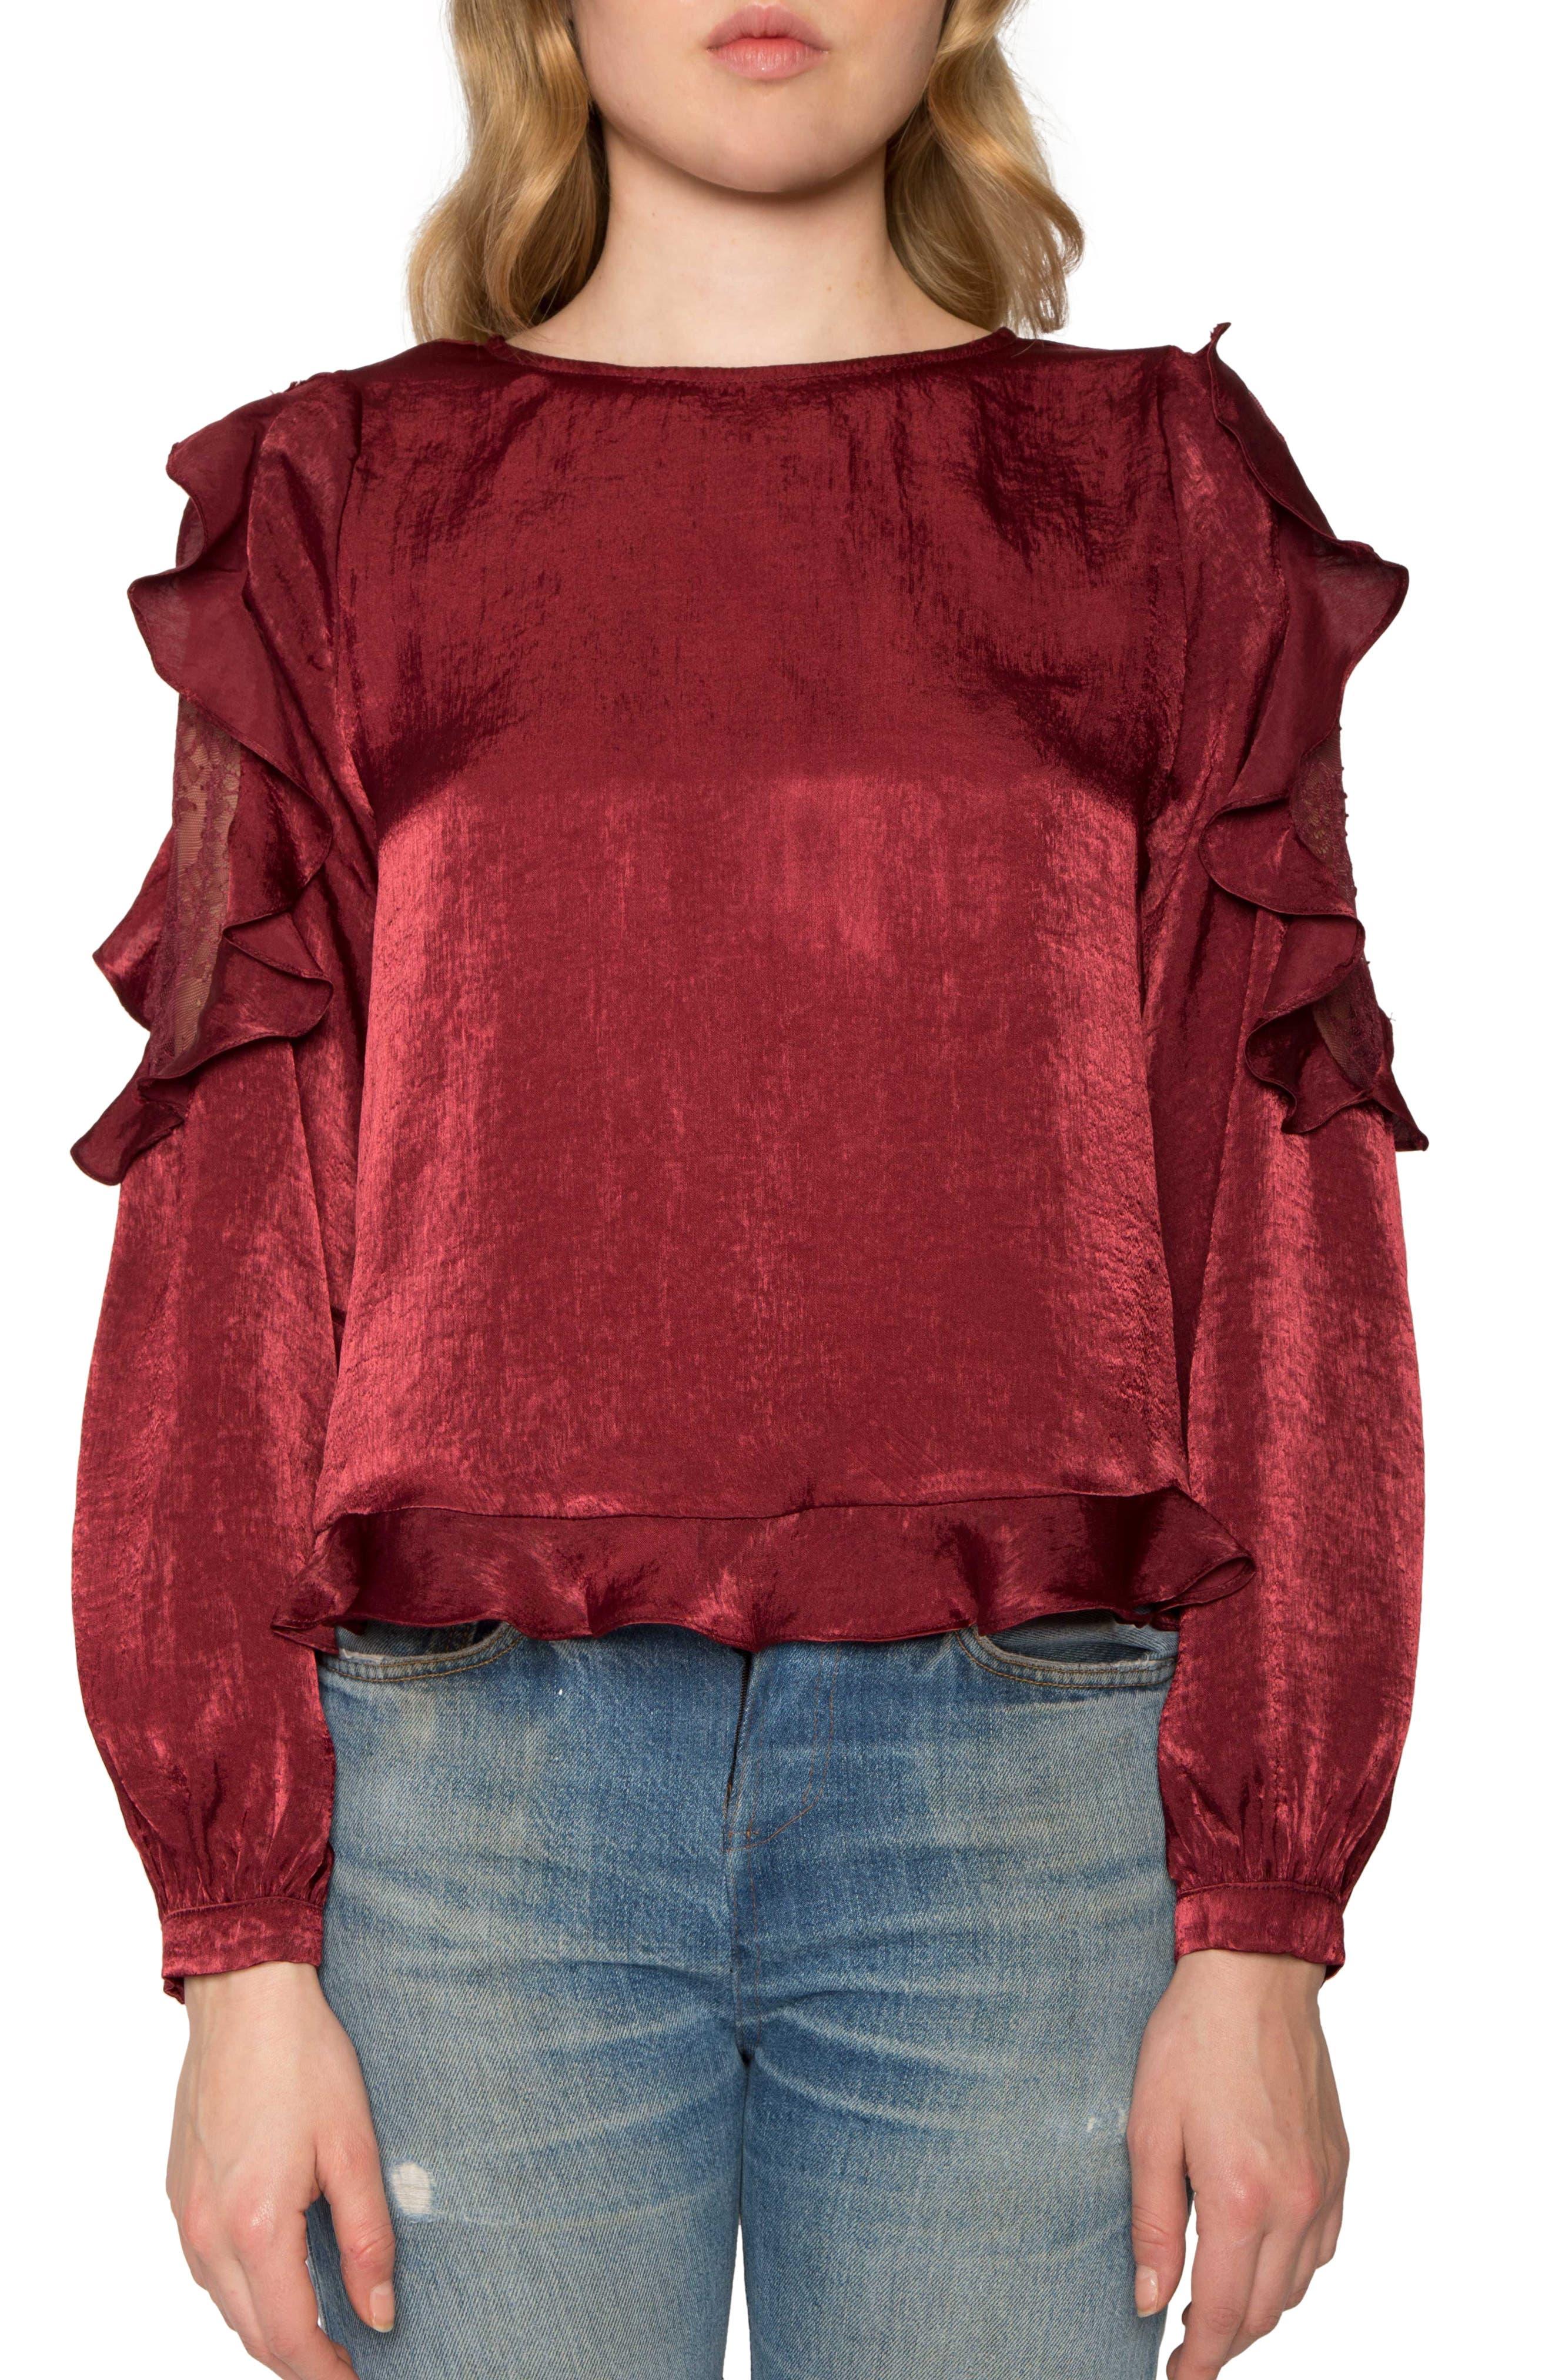 Lace Detail Ruffle Blouse,                         Main,                         color, Wine